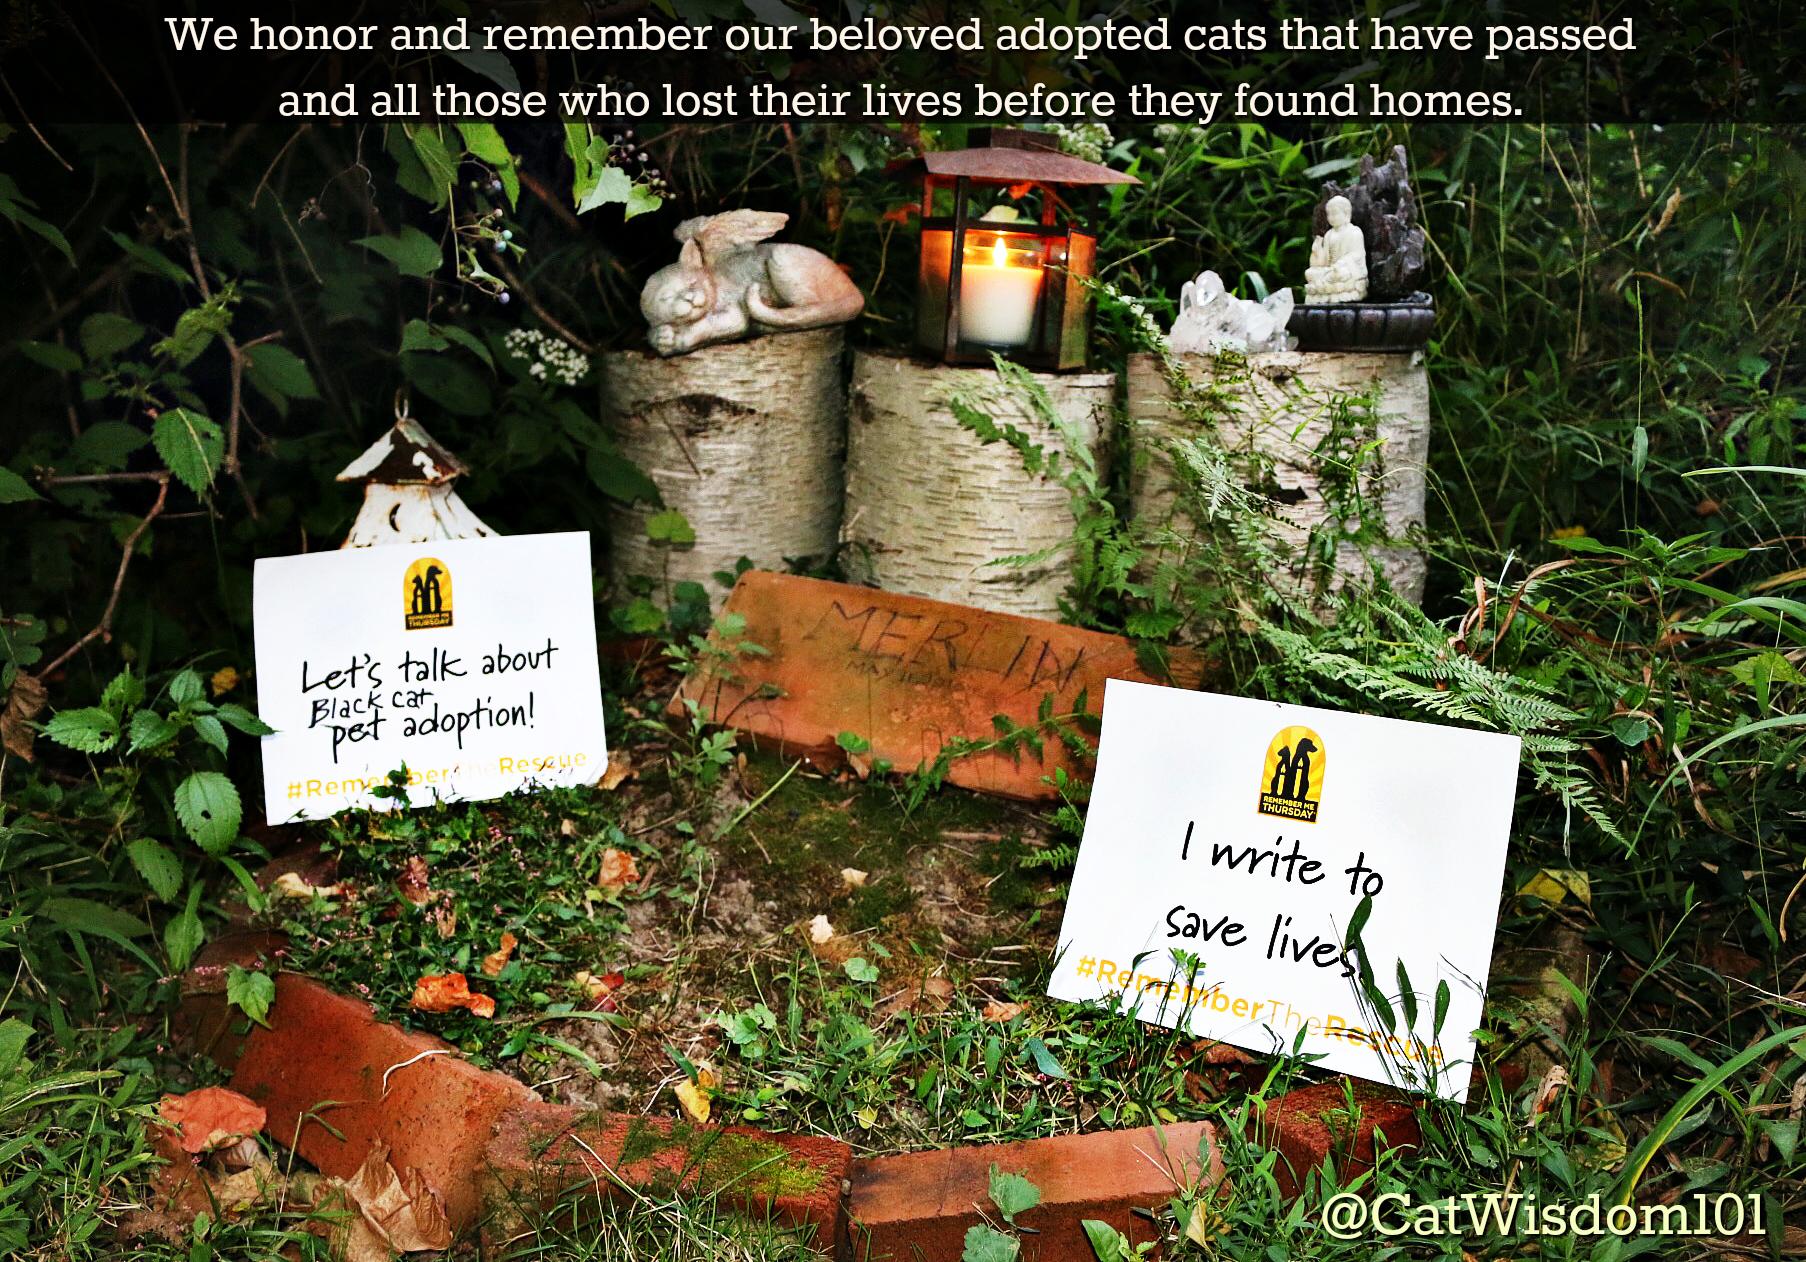 Cat_cemetery_catwisdom101_#remembermethursday